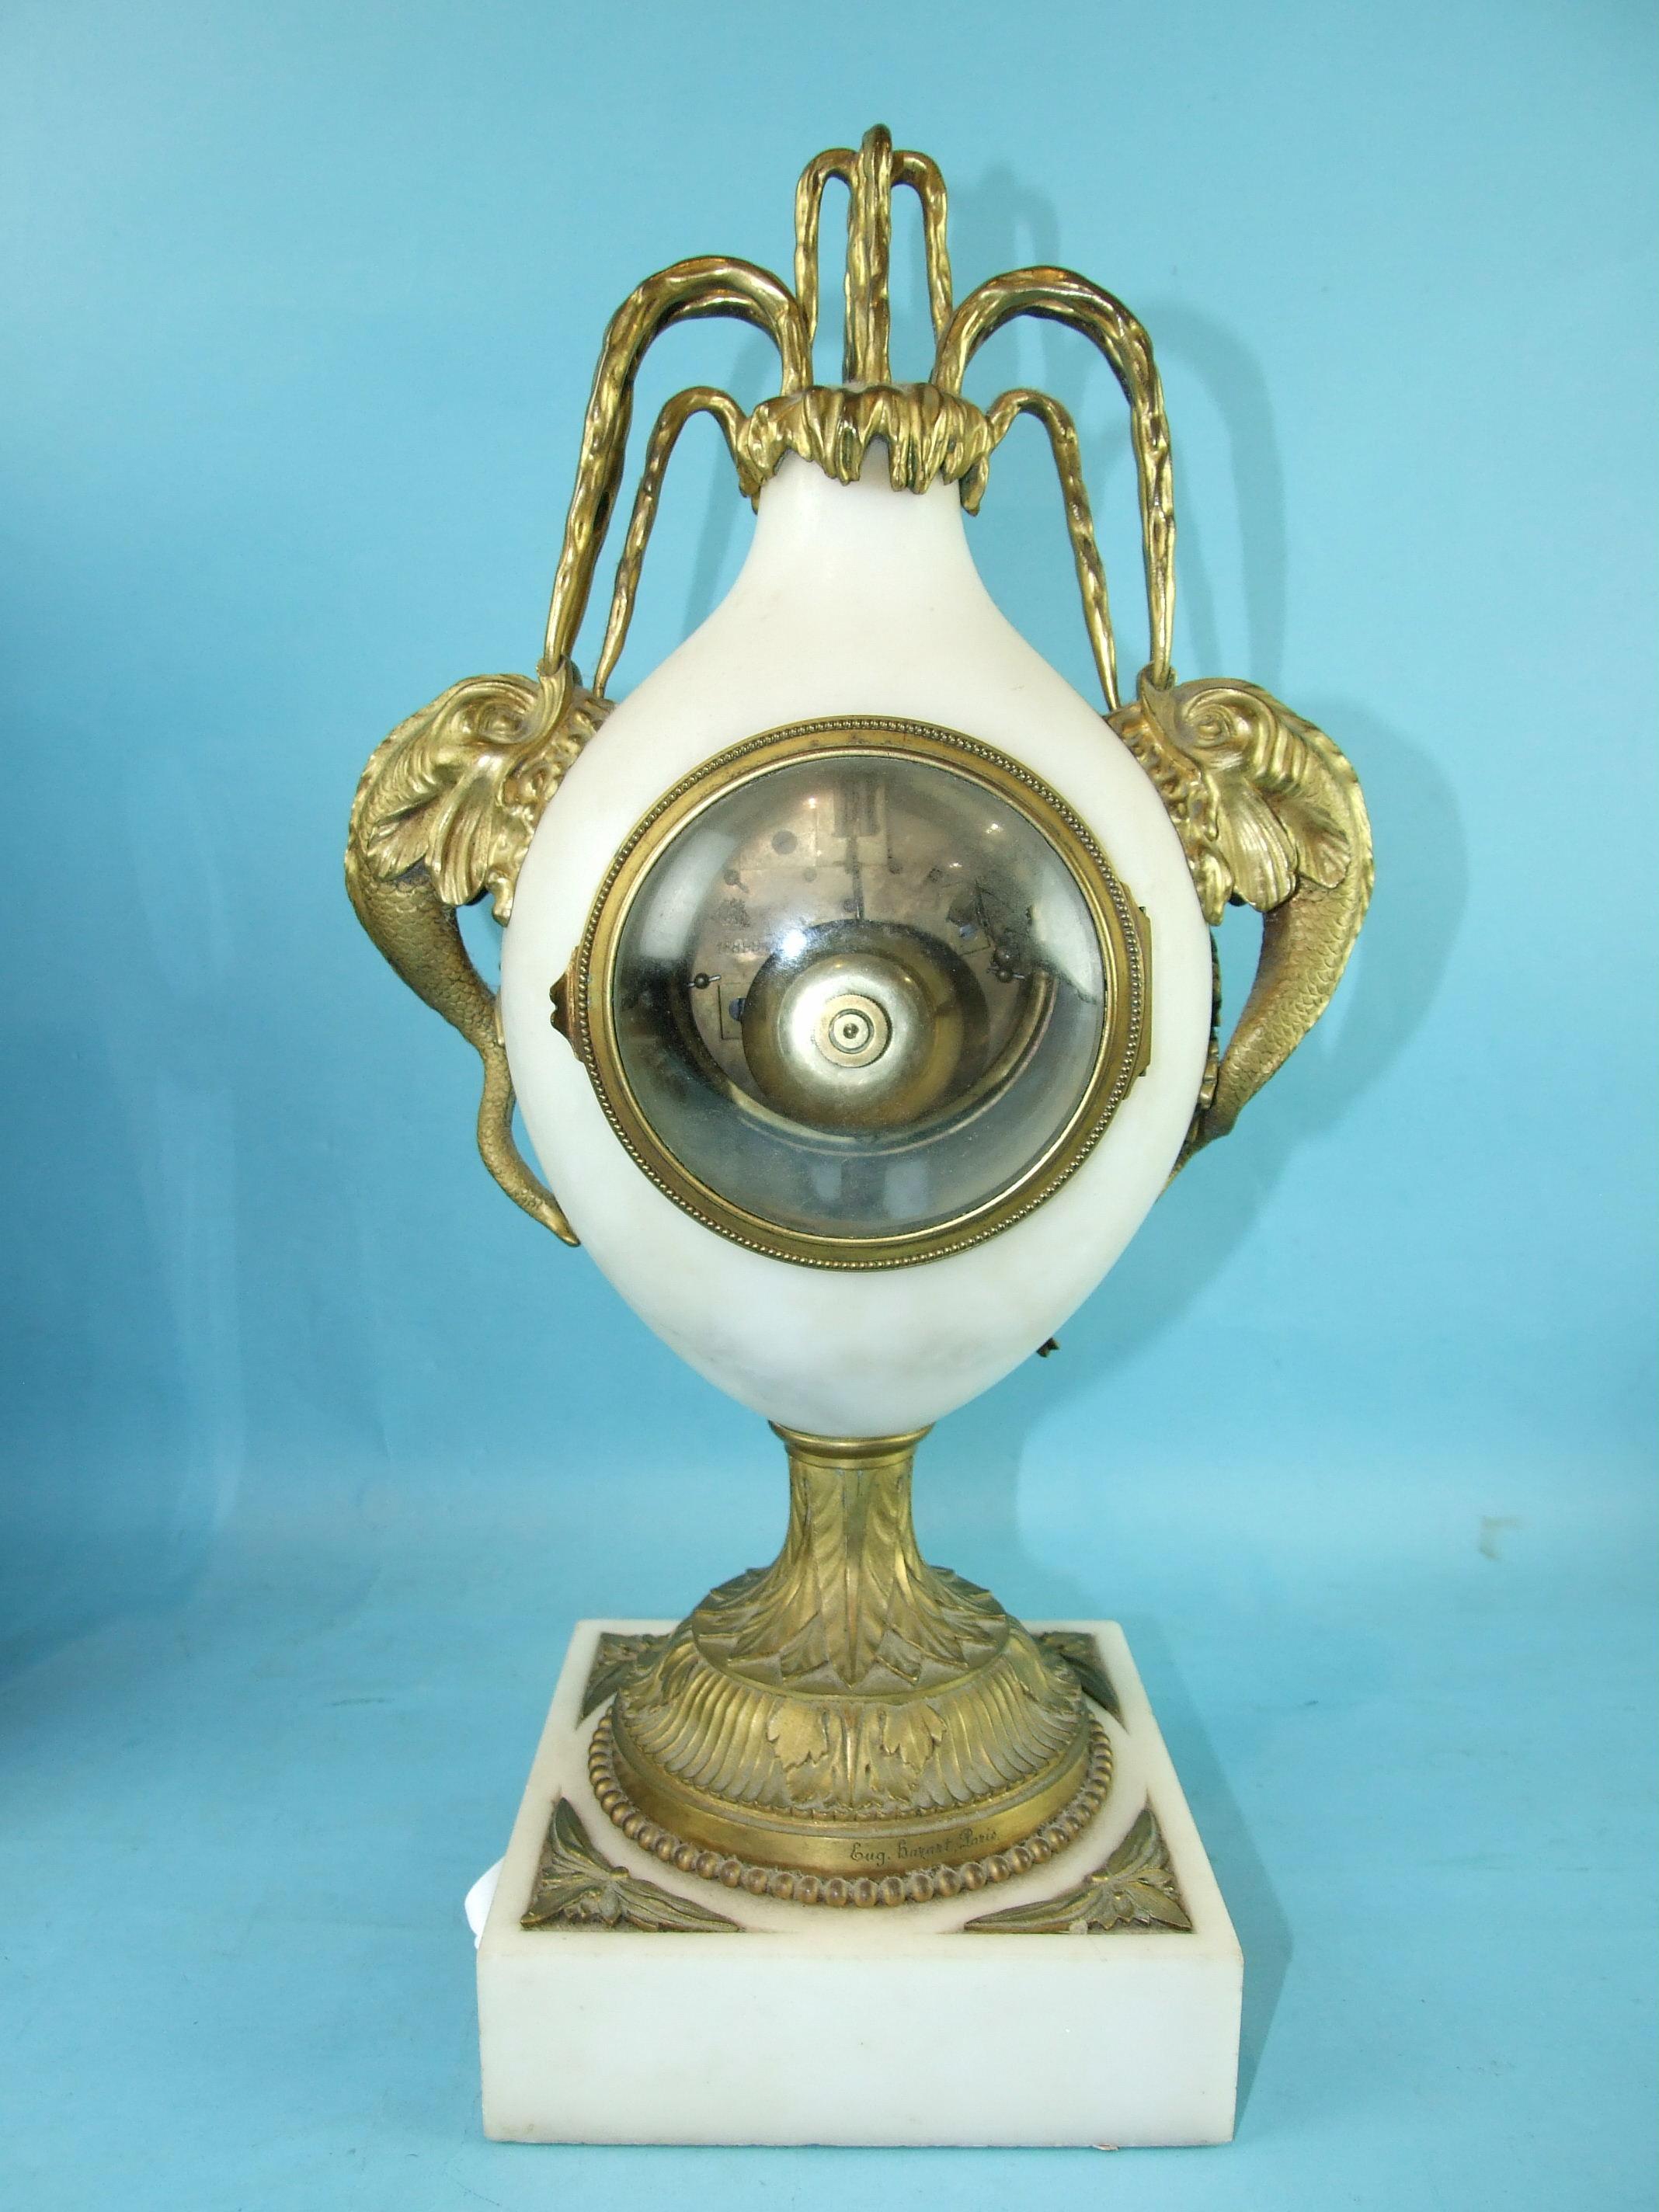 Lot 116 - Julian Béliard, Paris, a white marble and ormolu mantel clock of tear shape, on pedestal and